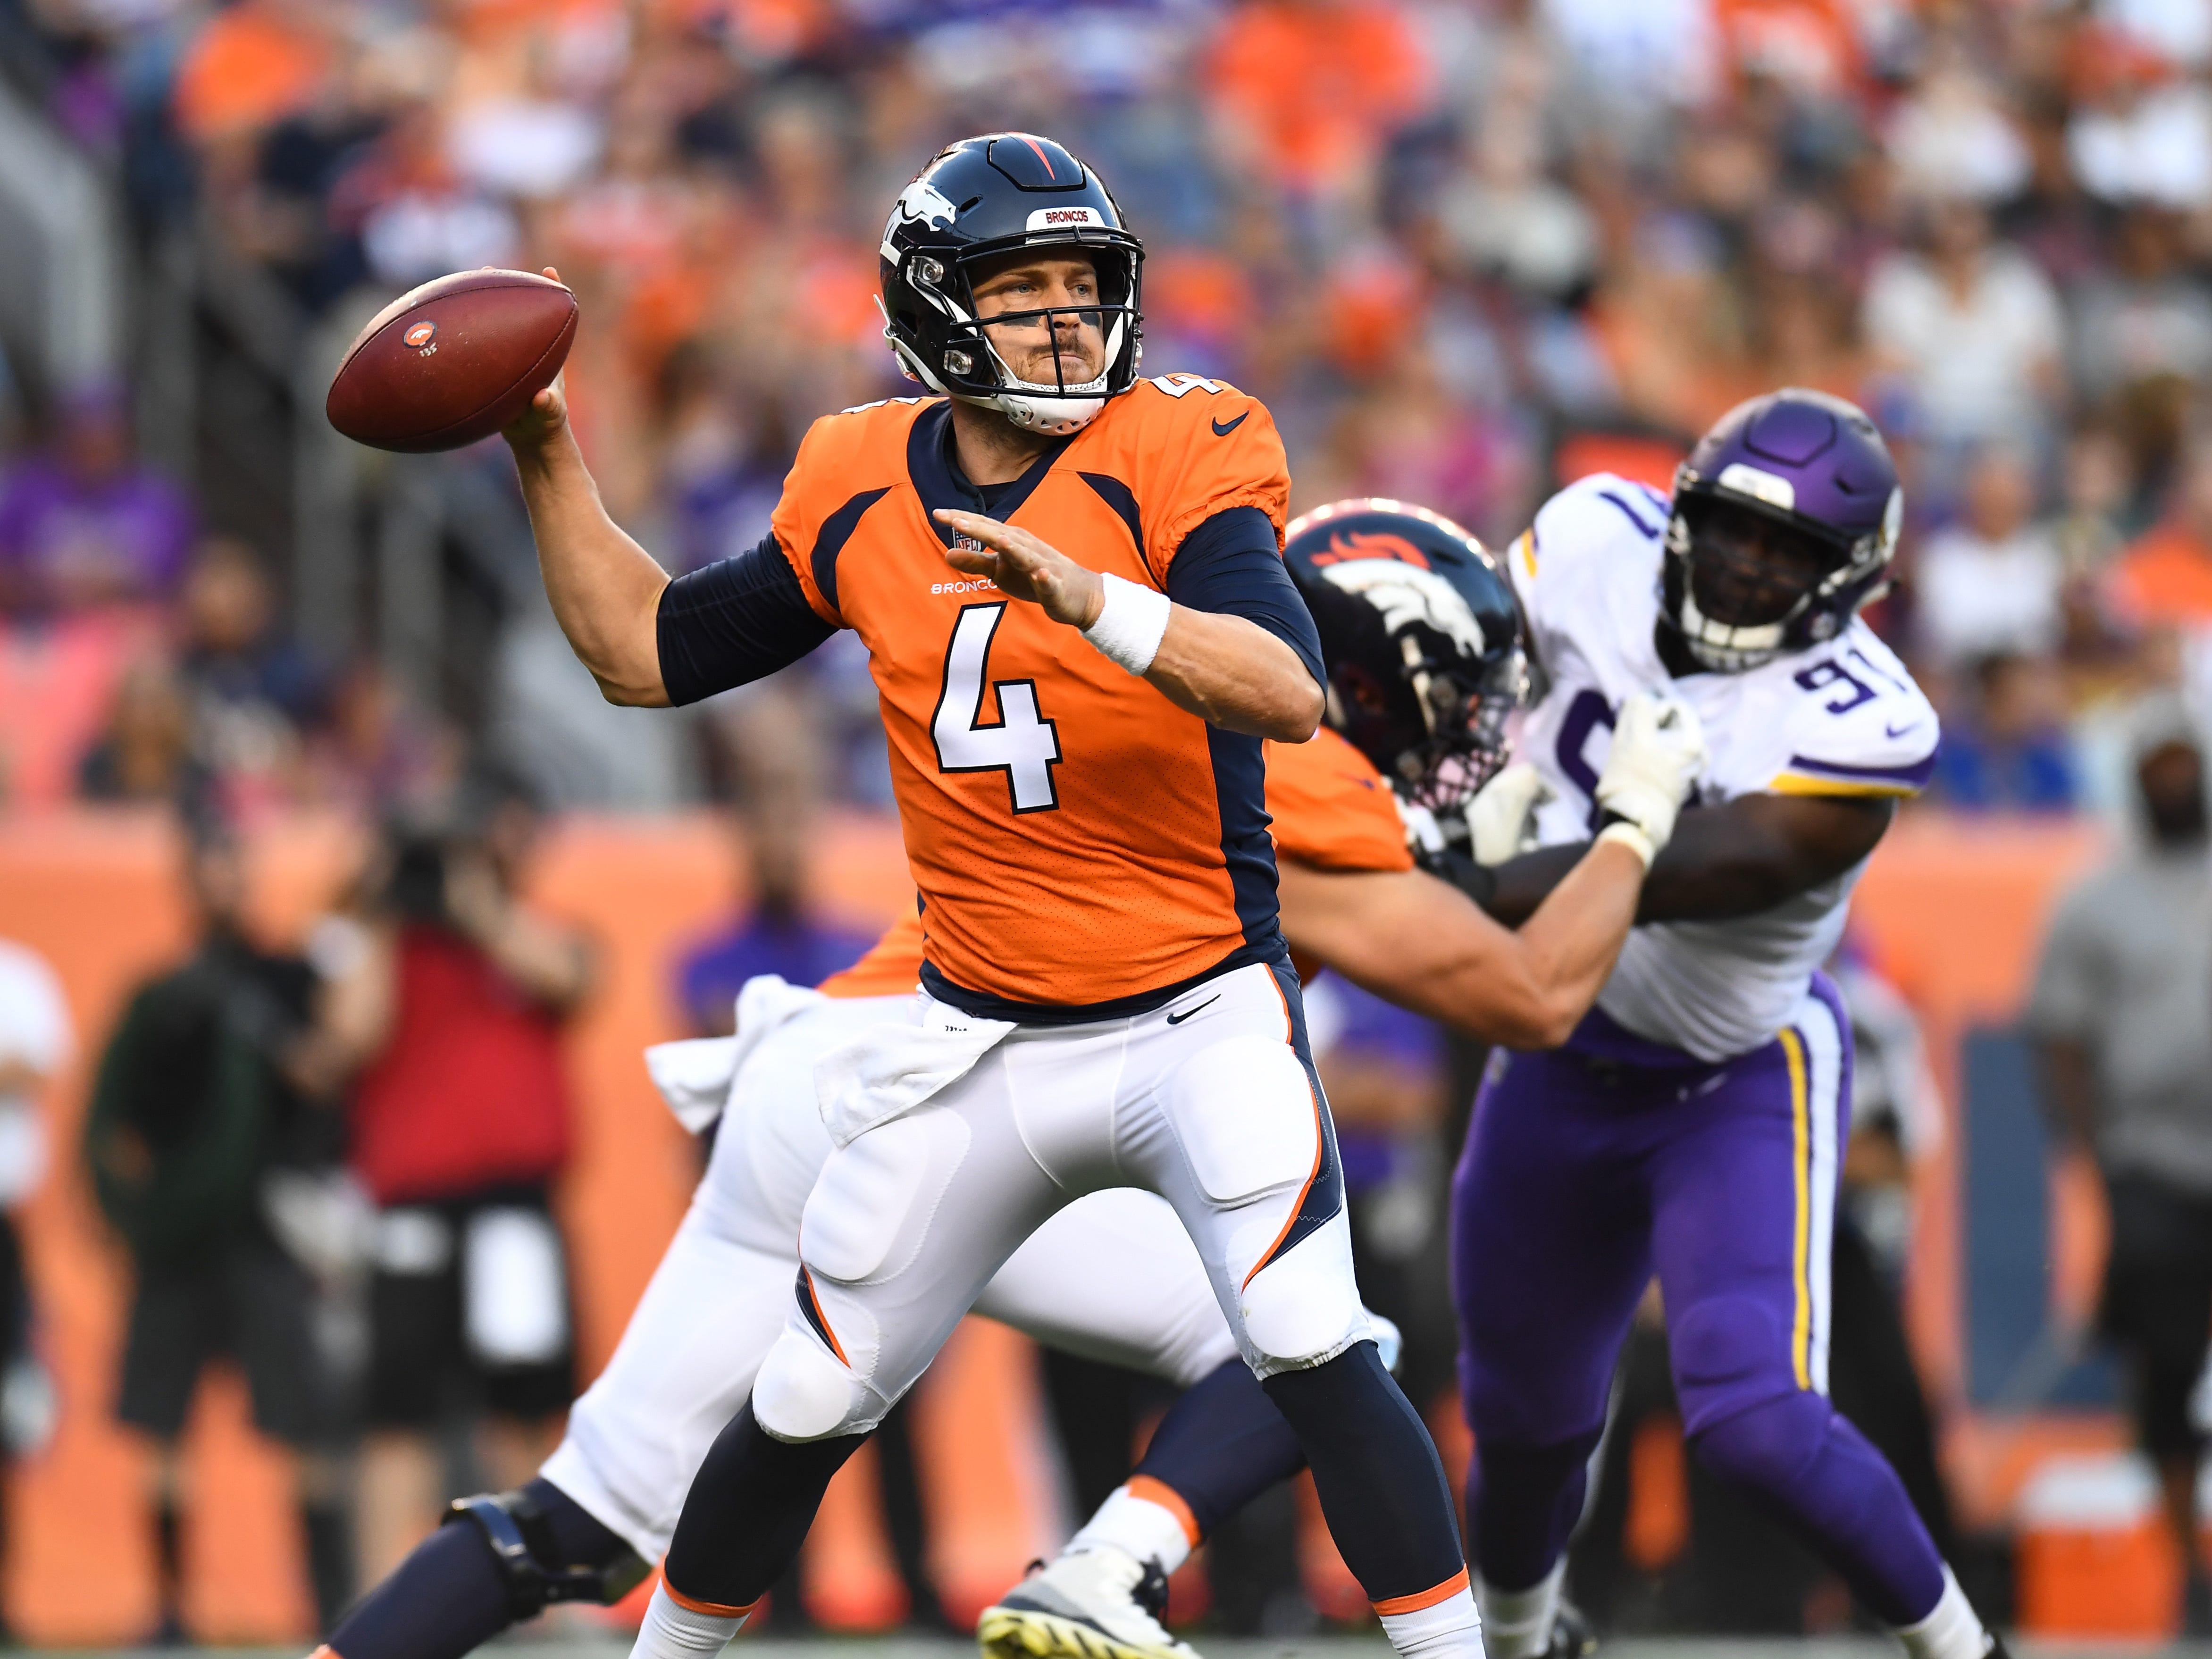 Denver Broncos: Case Keenum